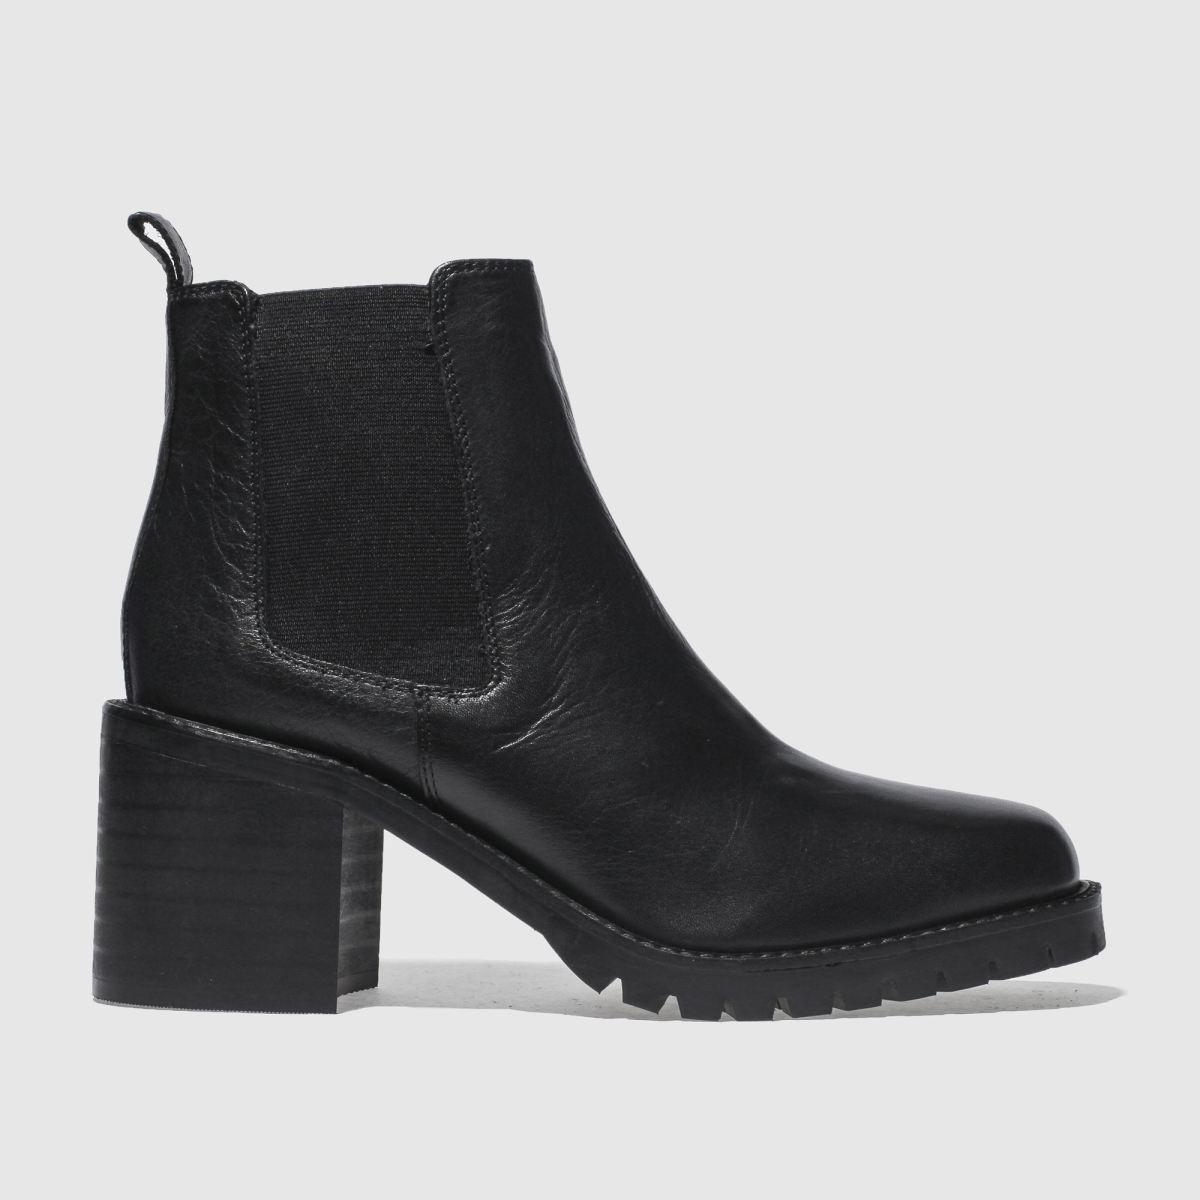 Schuh Black Strut Boots